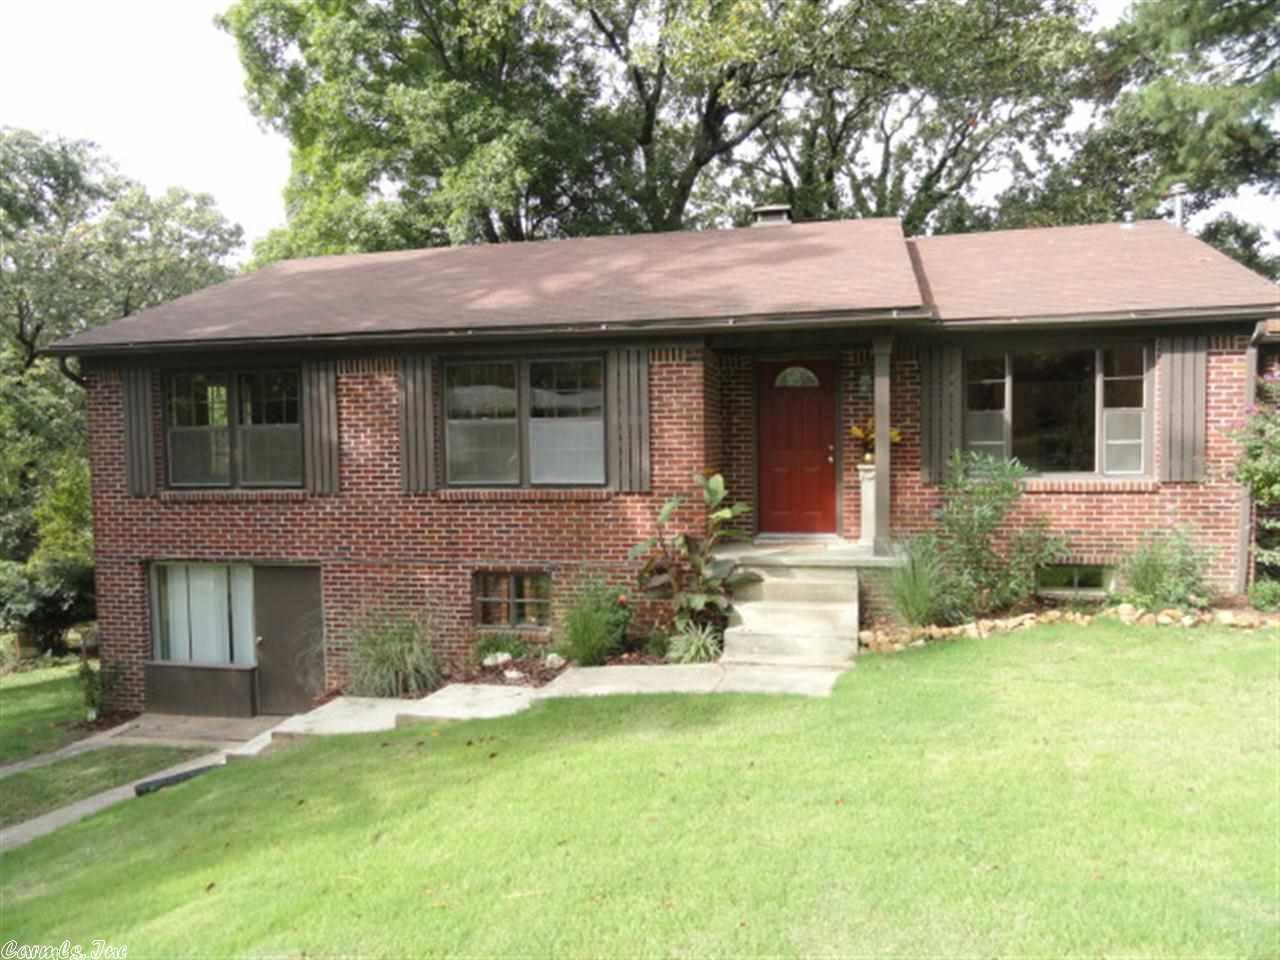 1625 Pine Valley Rd, Little Rock, AR 72207 | MLS# 10365715 ...